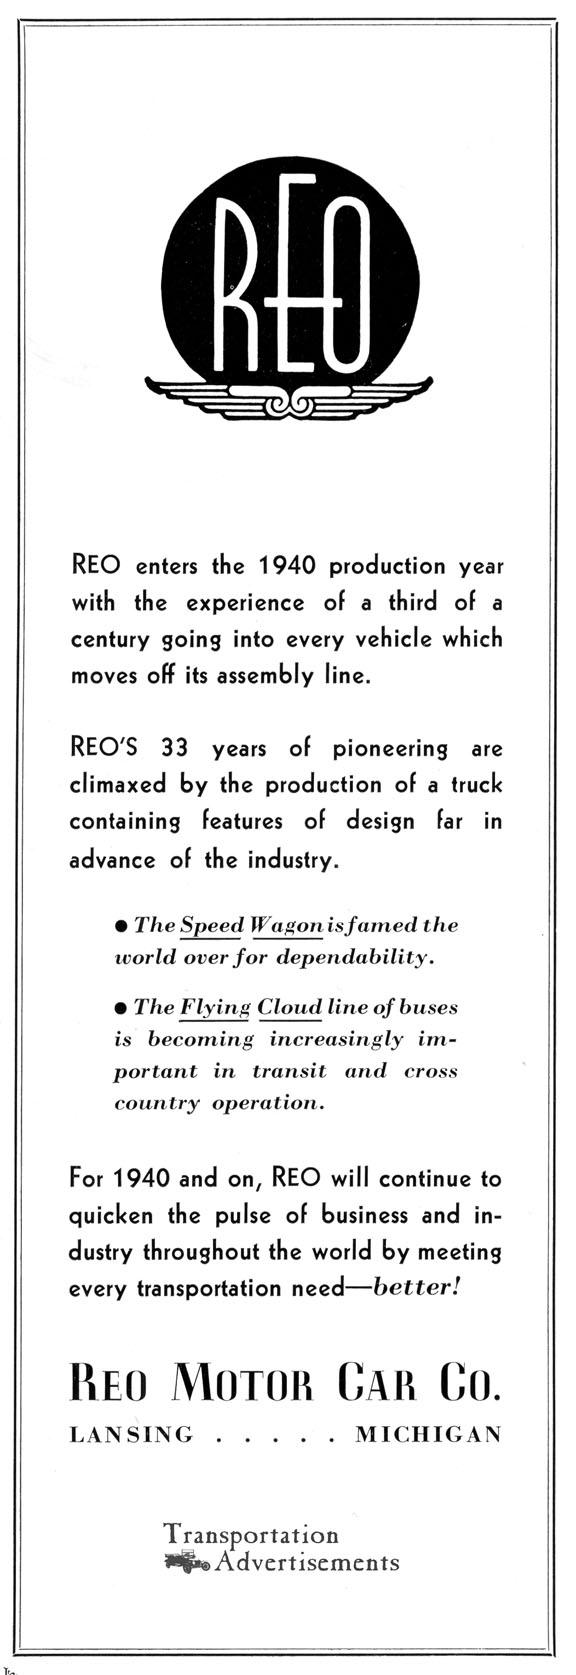 1939 REO Motor Car Company advertisement